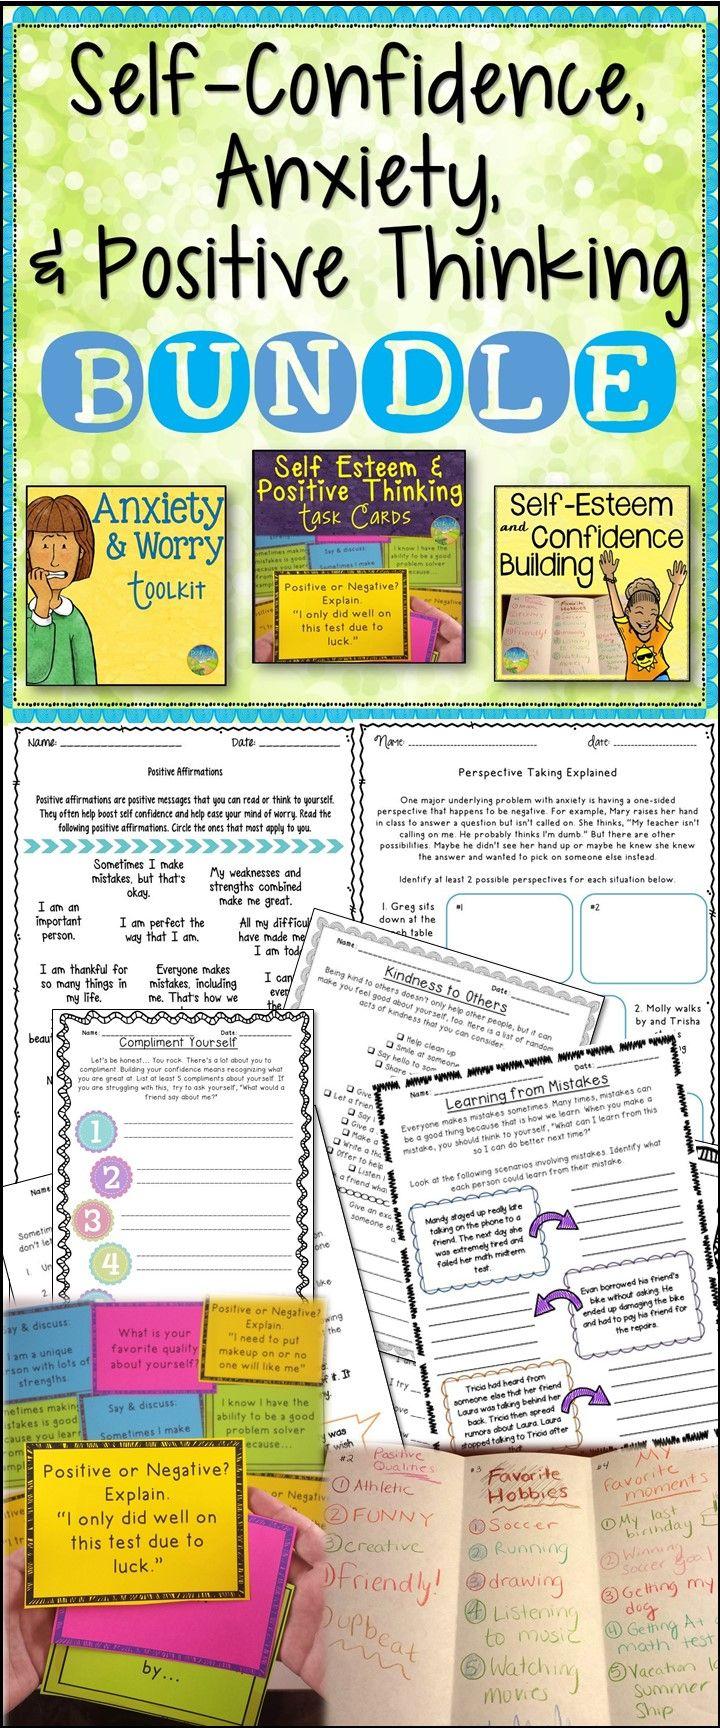 Workbooks anti anxiety workbook : Self-Confidence, Anxiety, and Positive Thinking BUNDLE